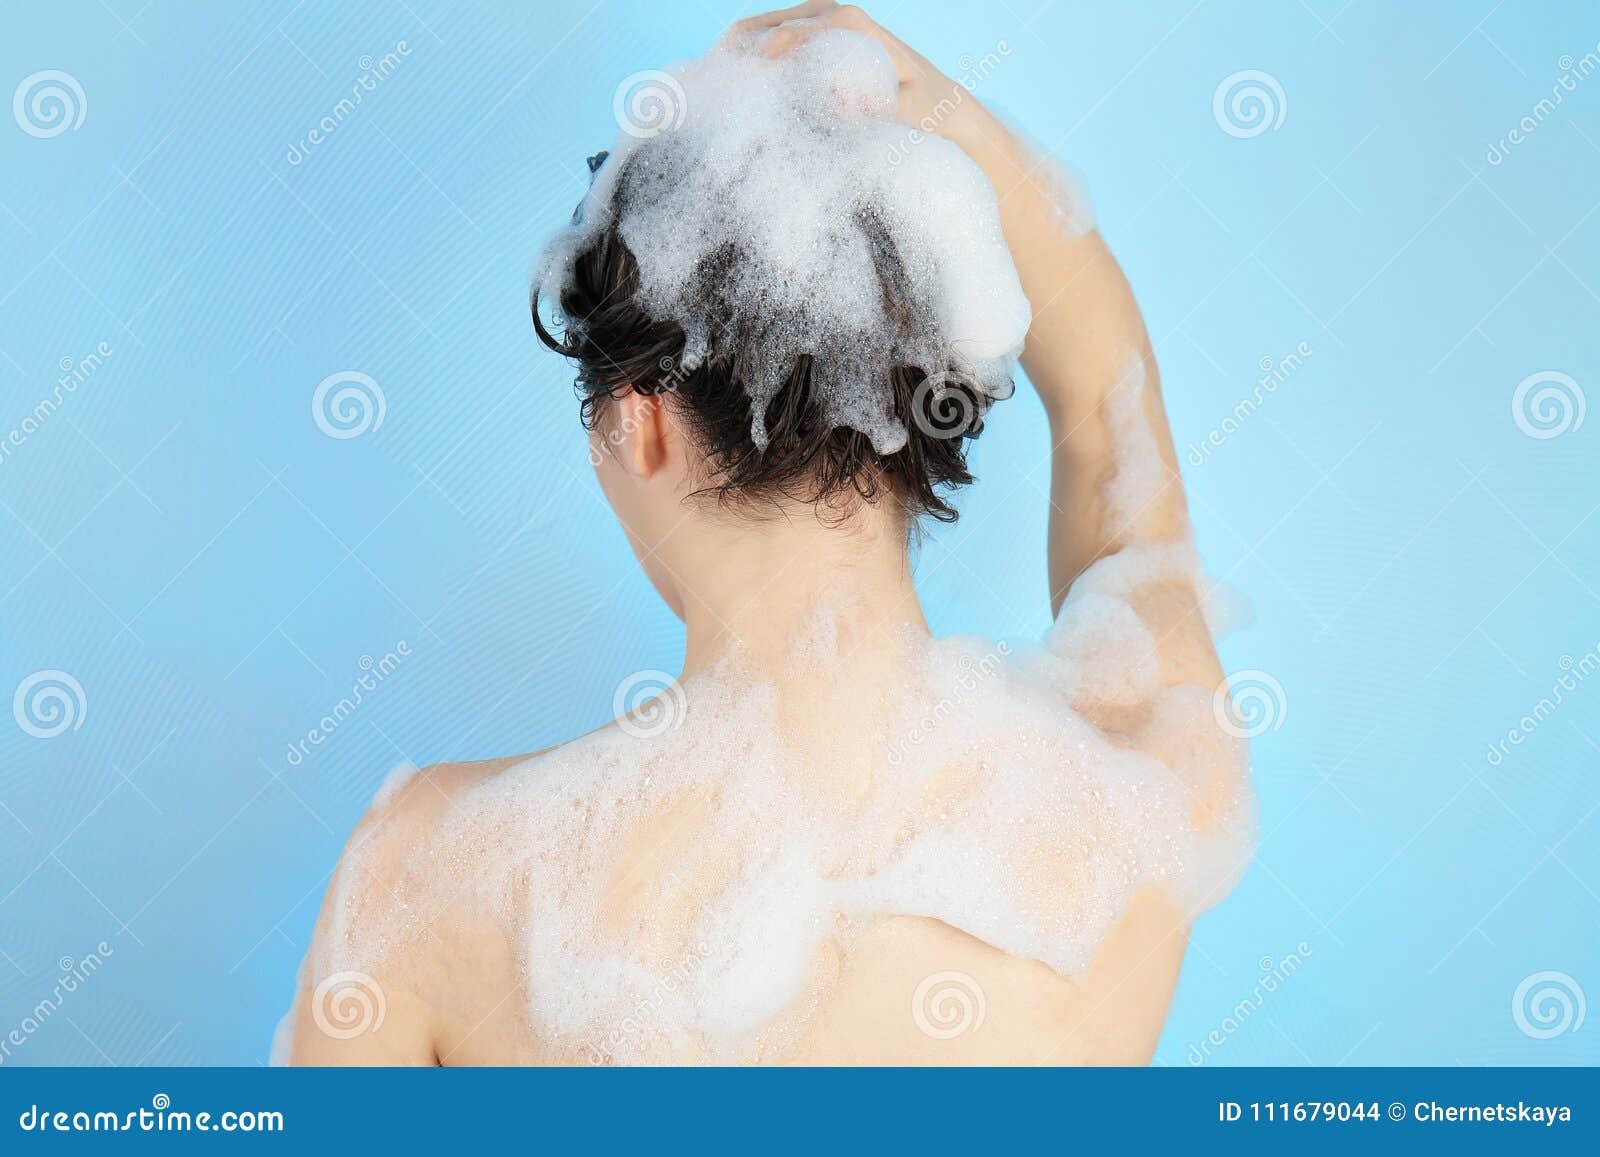 Woman Taking A Long Hot Shower Washing Her Hair Stock